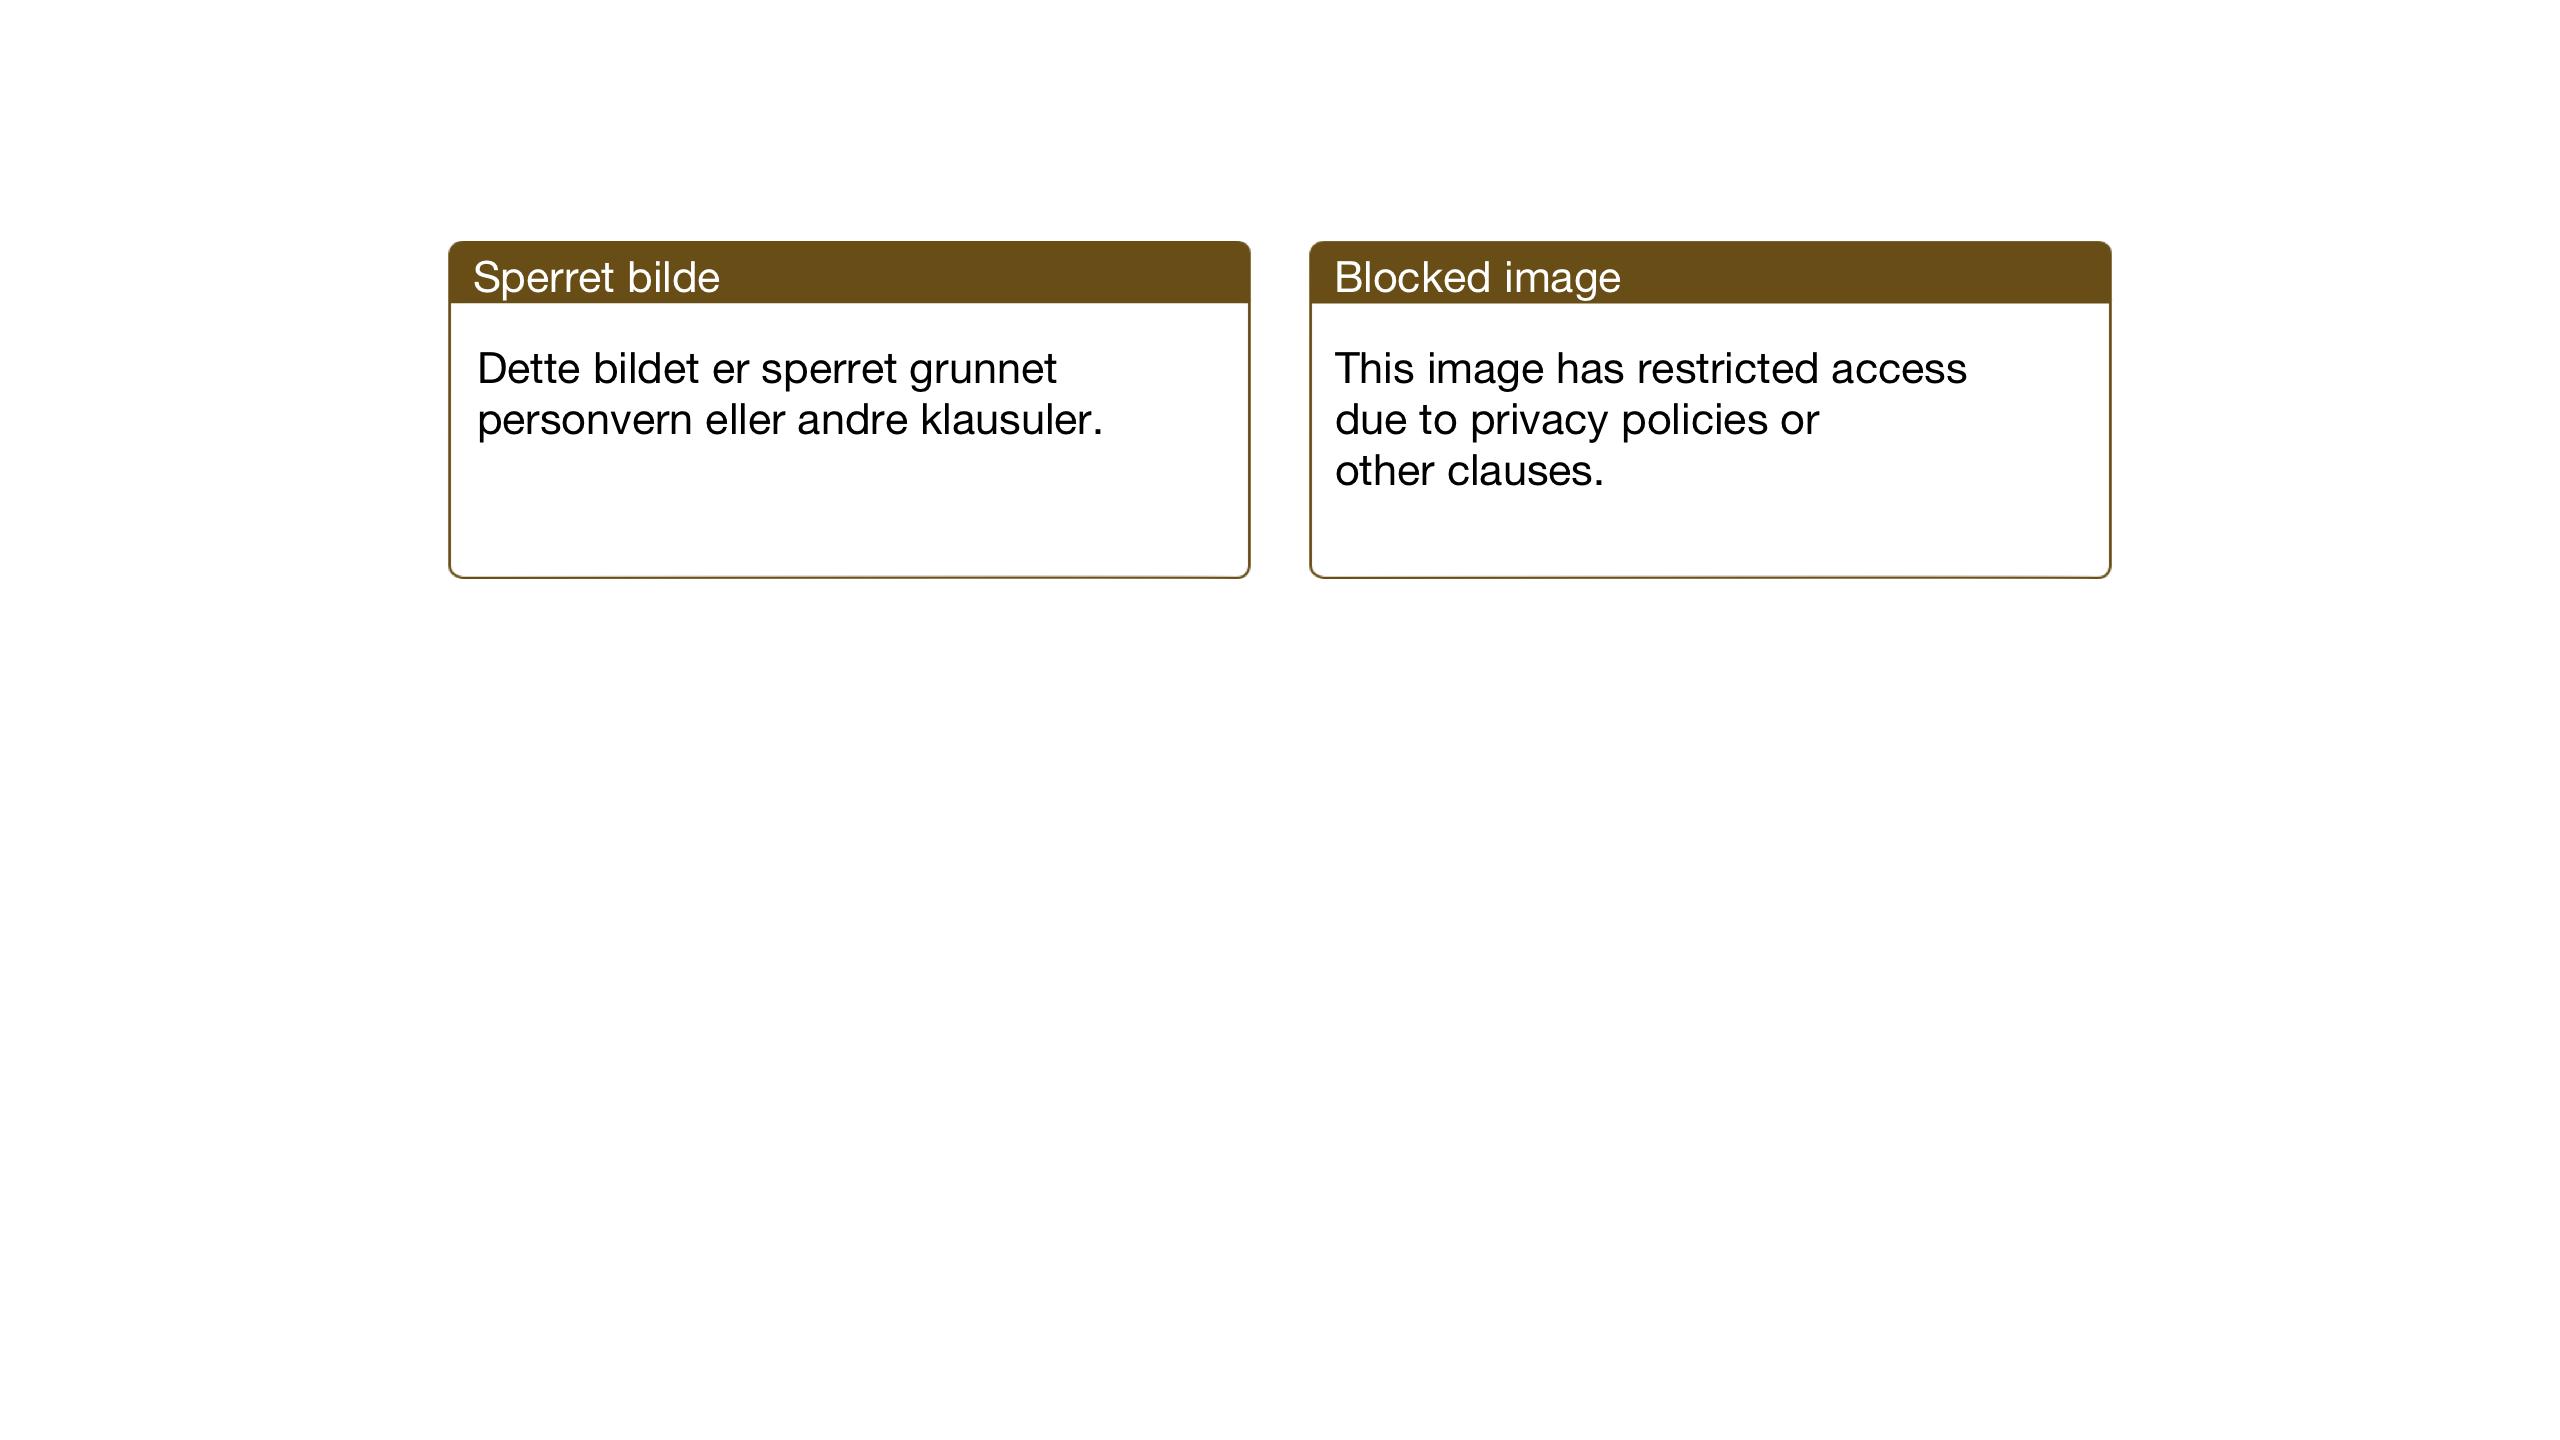 SAB, Domkirken Sokneprestembete, H/Haa: Ministerialbok nr. C 9, 1958-2001, s. 163b-164a